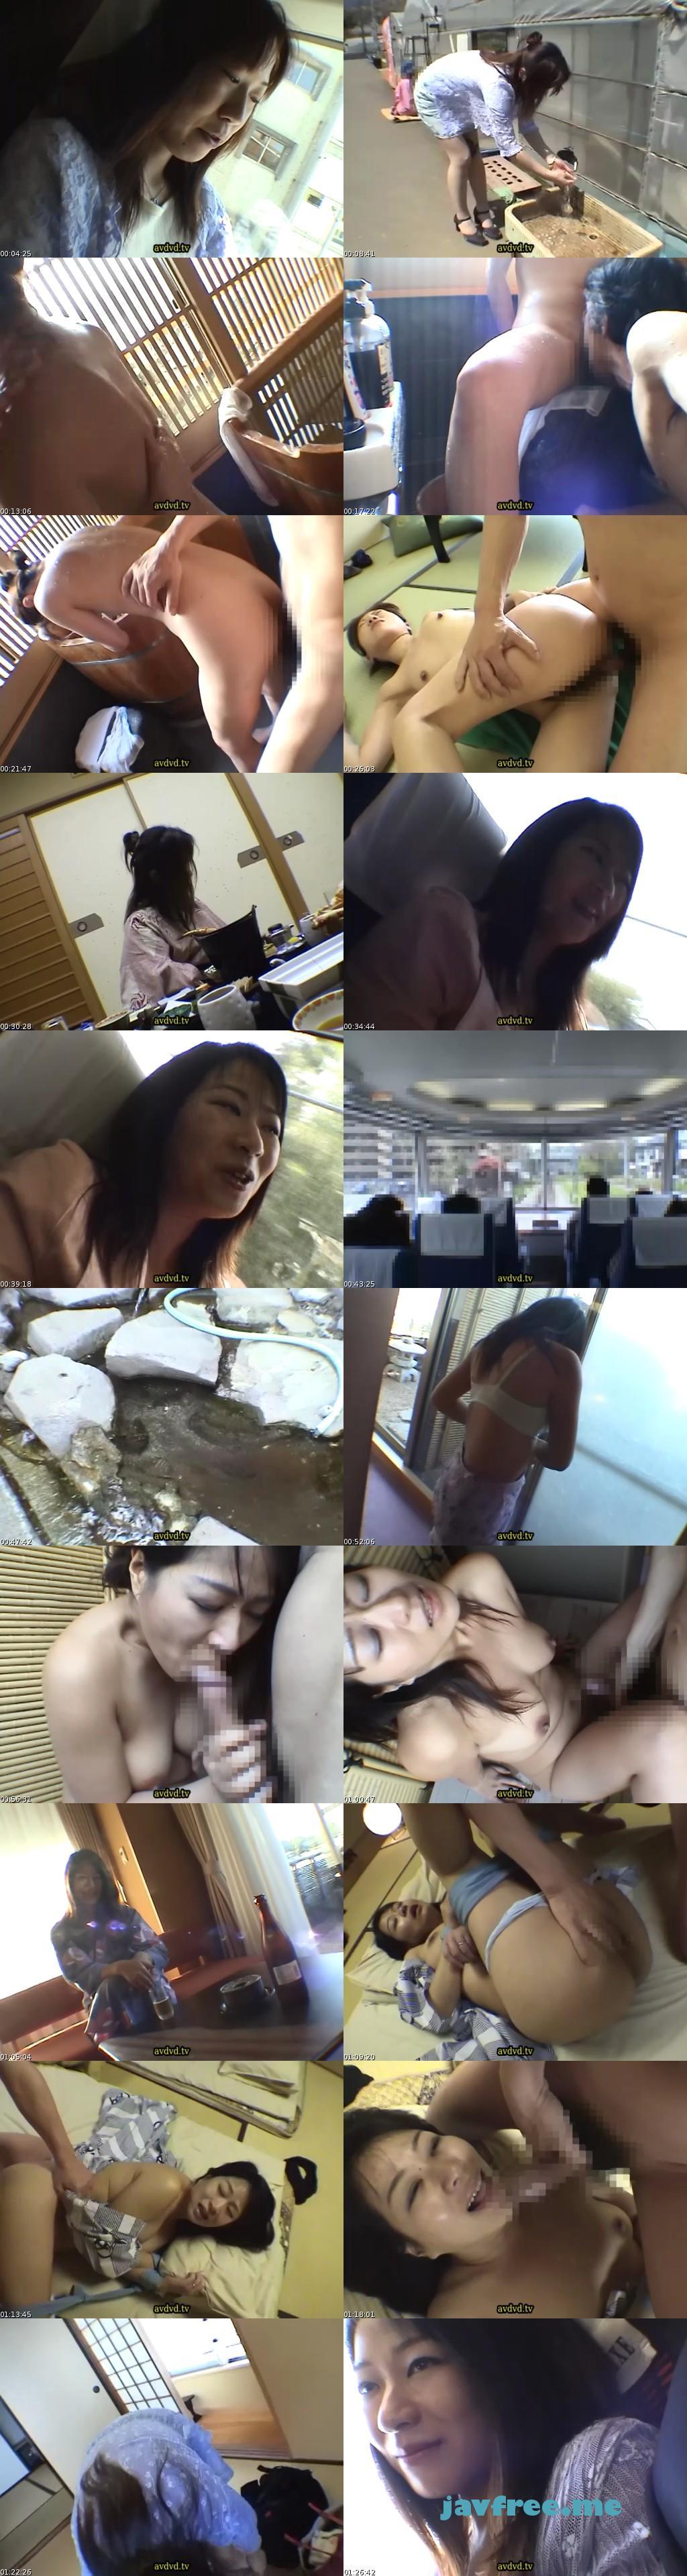 [REBN 013] 〜本物人妻密会ドキュメント〜 人妻不倫旅情 第二巻 伊豆・熱海編 REBN